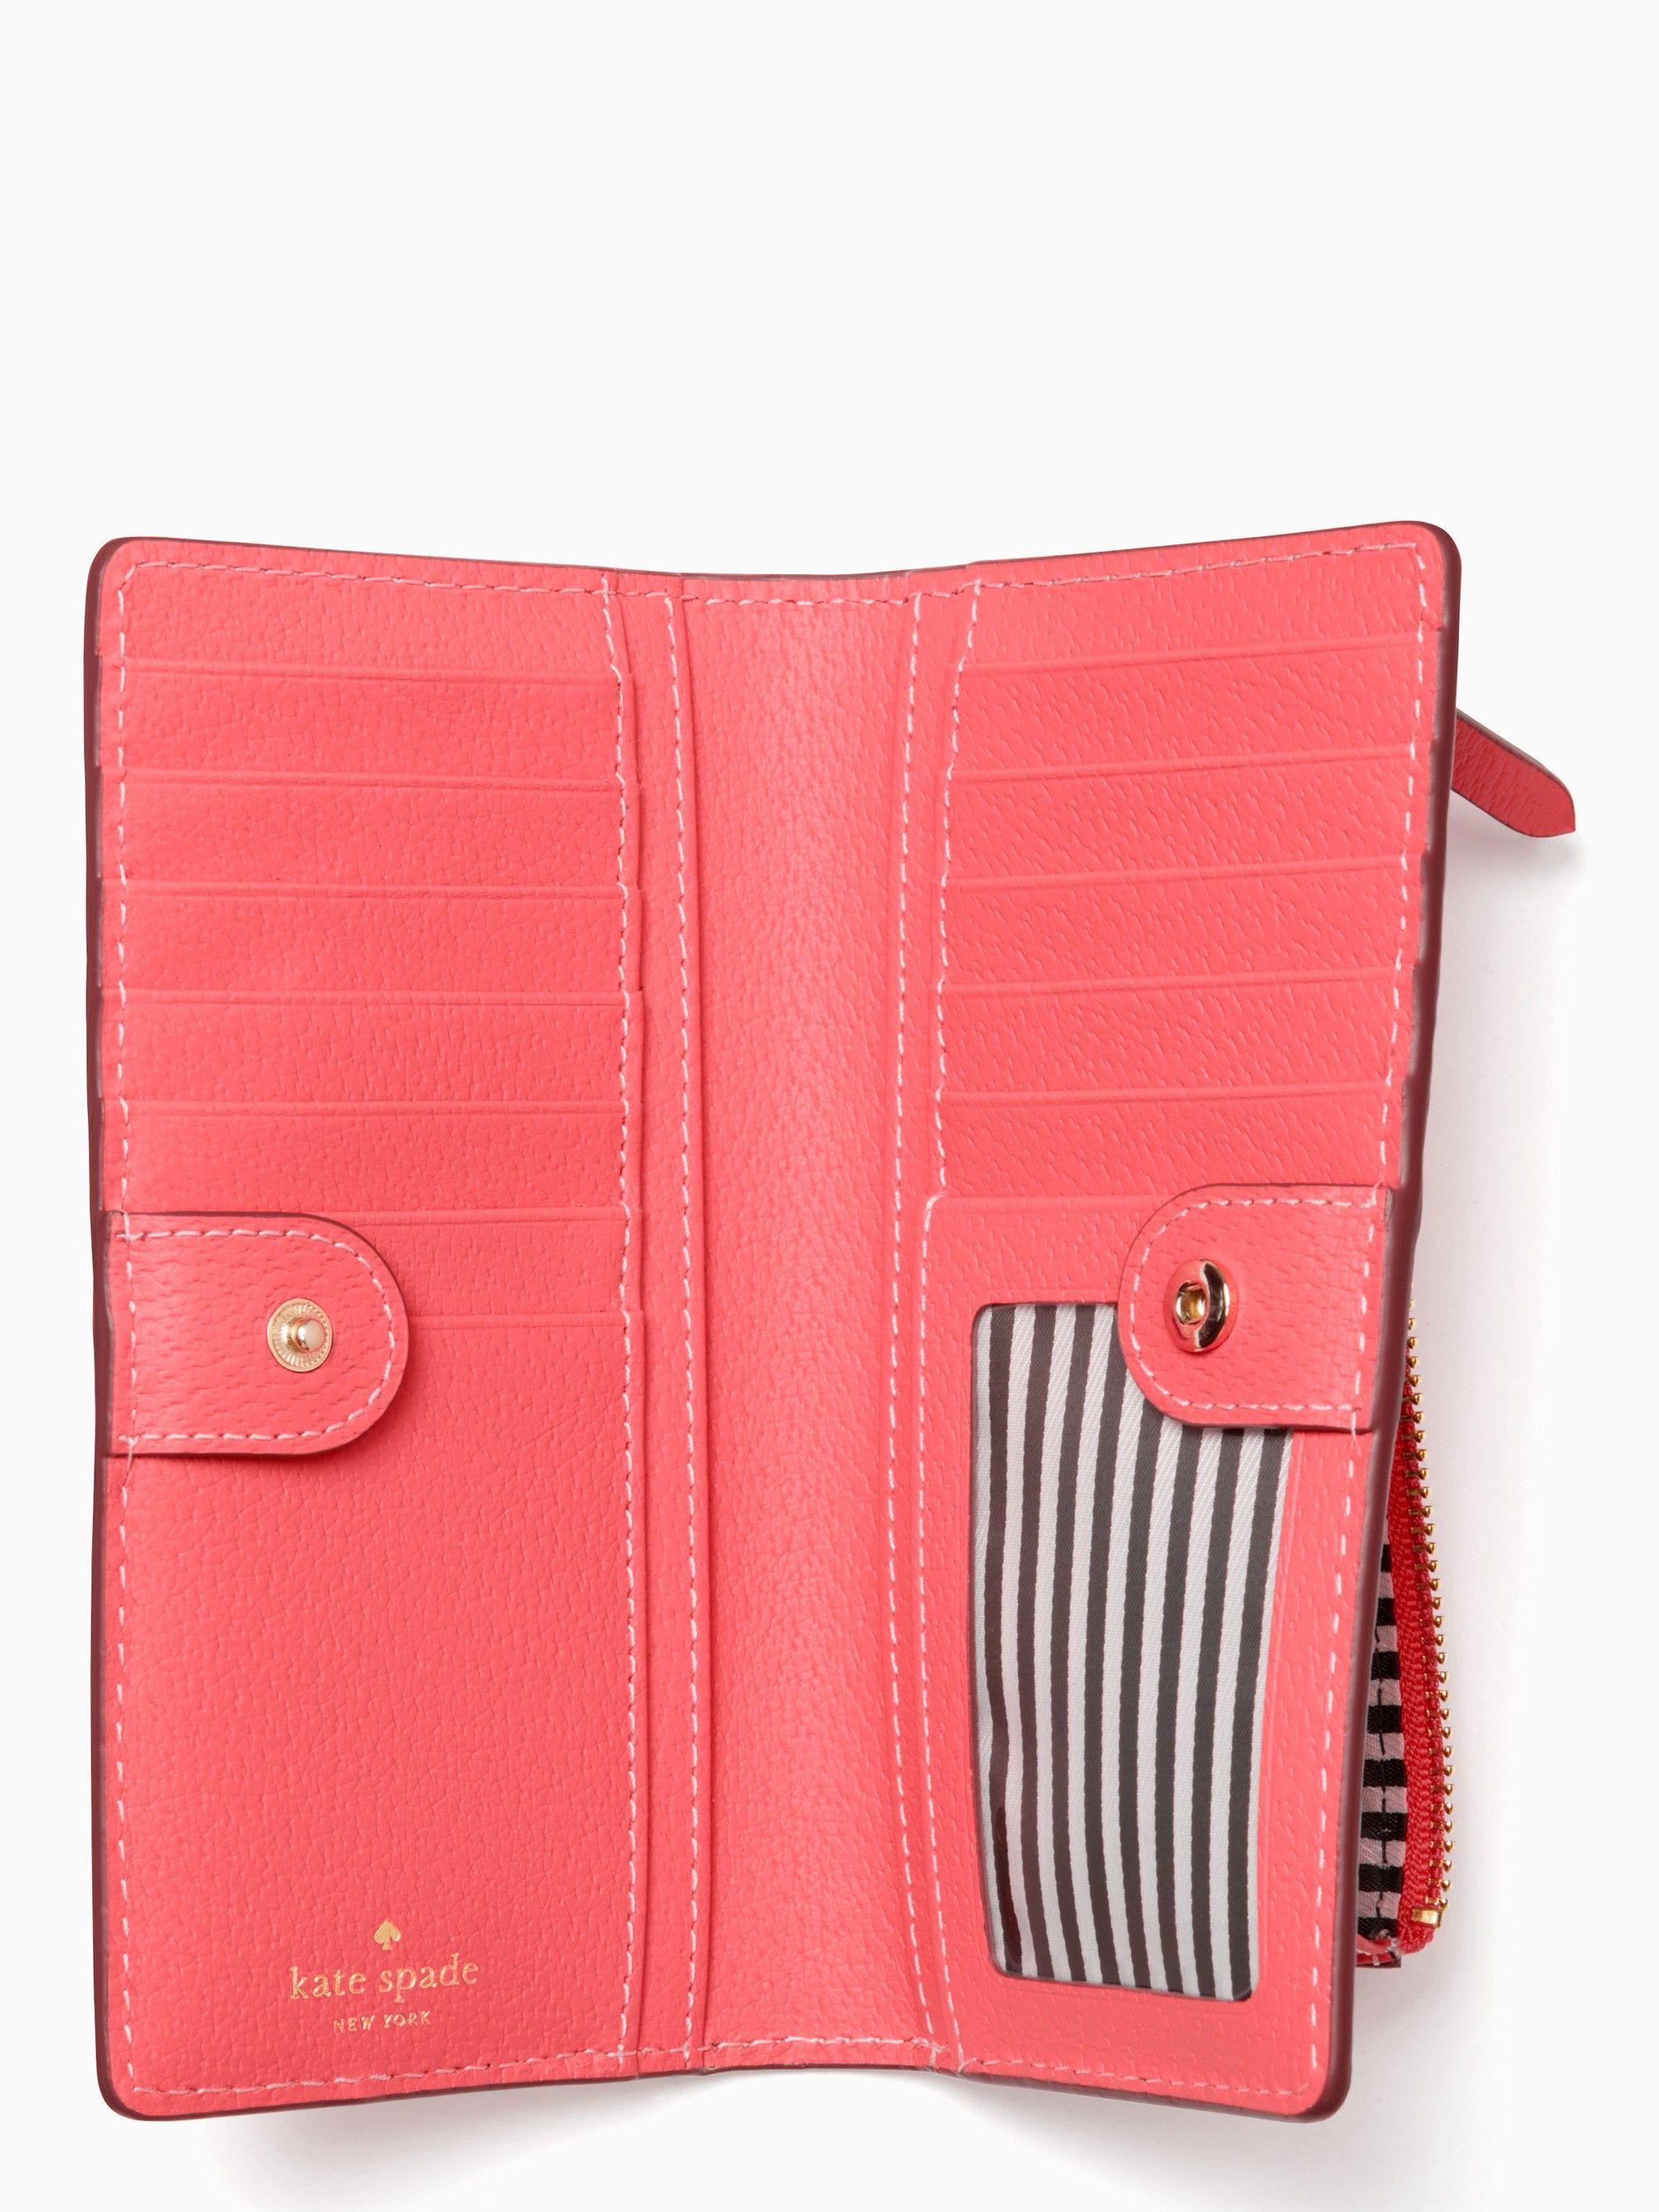 28ec192d7257 Kate Spade Thompson Street Stacy - Bright Flamingo Gold